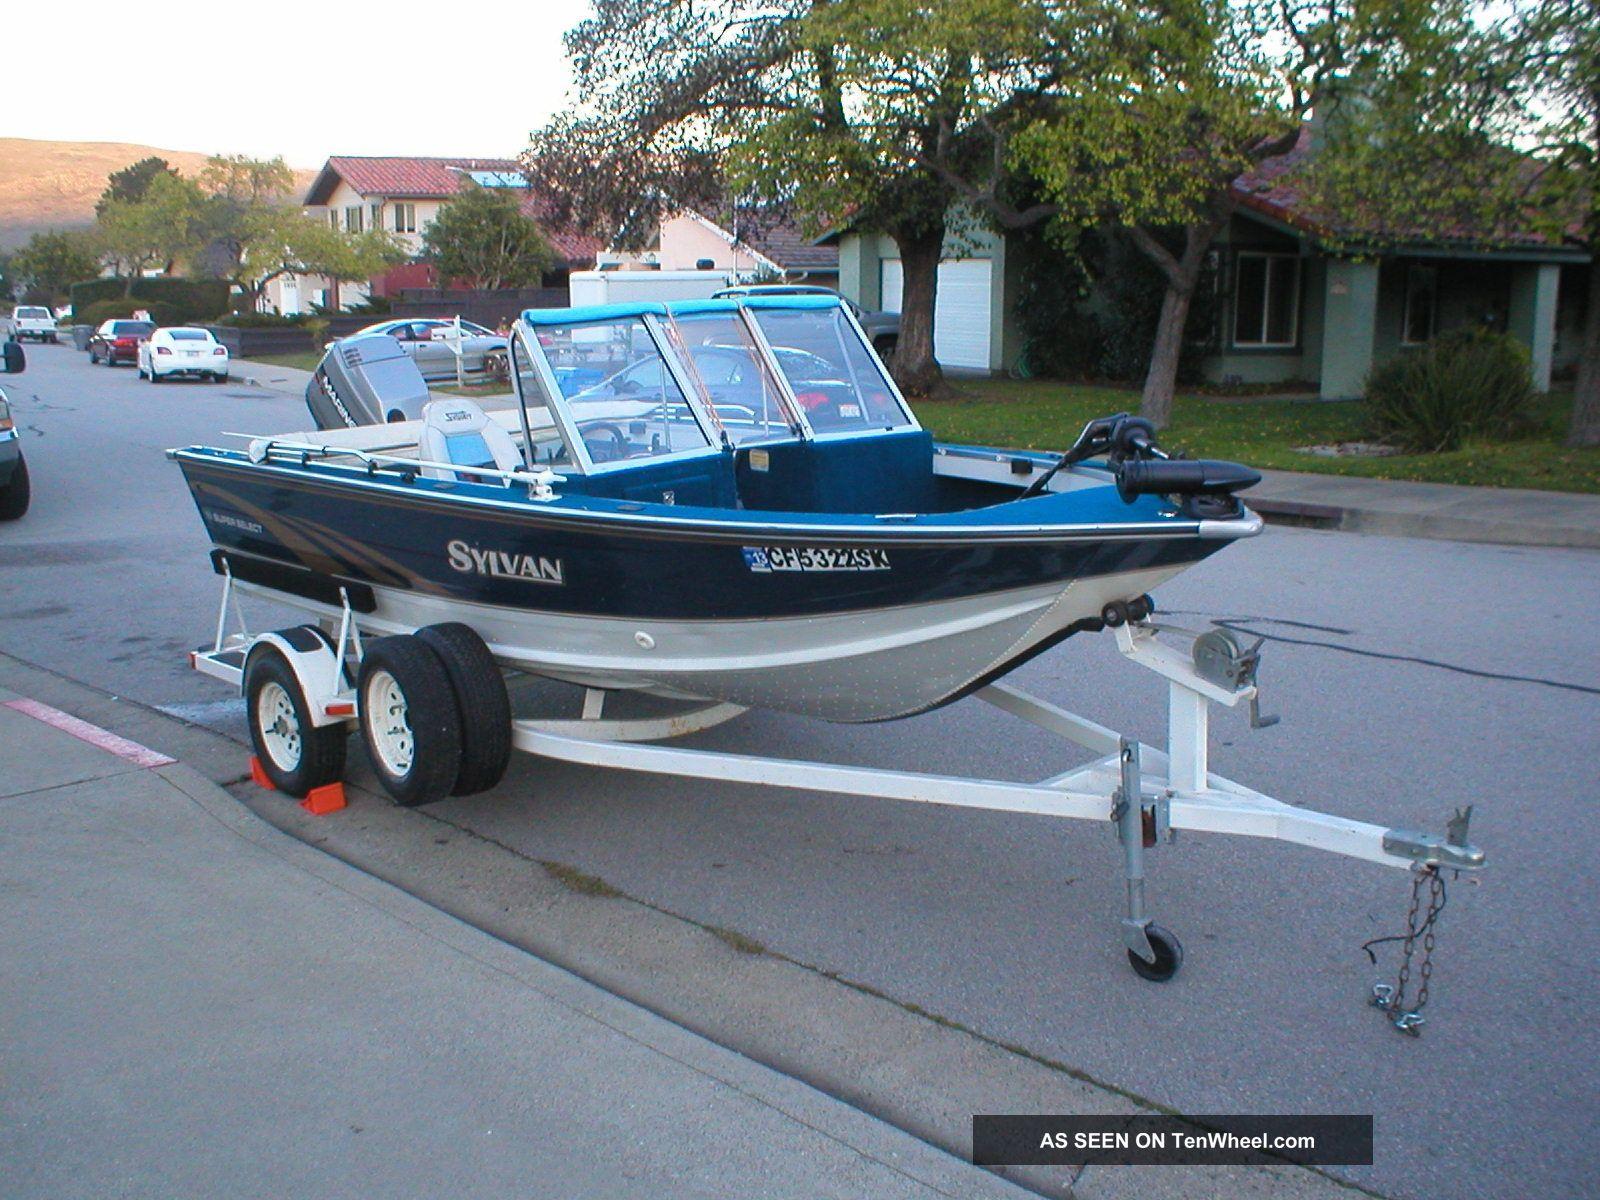 1996 Sylvan 16 Sport Select Other Freshwater Fishing photo